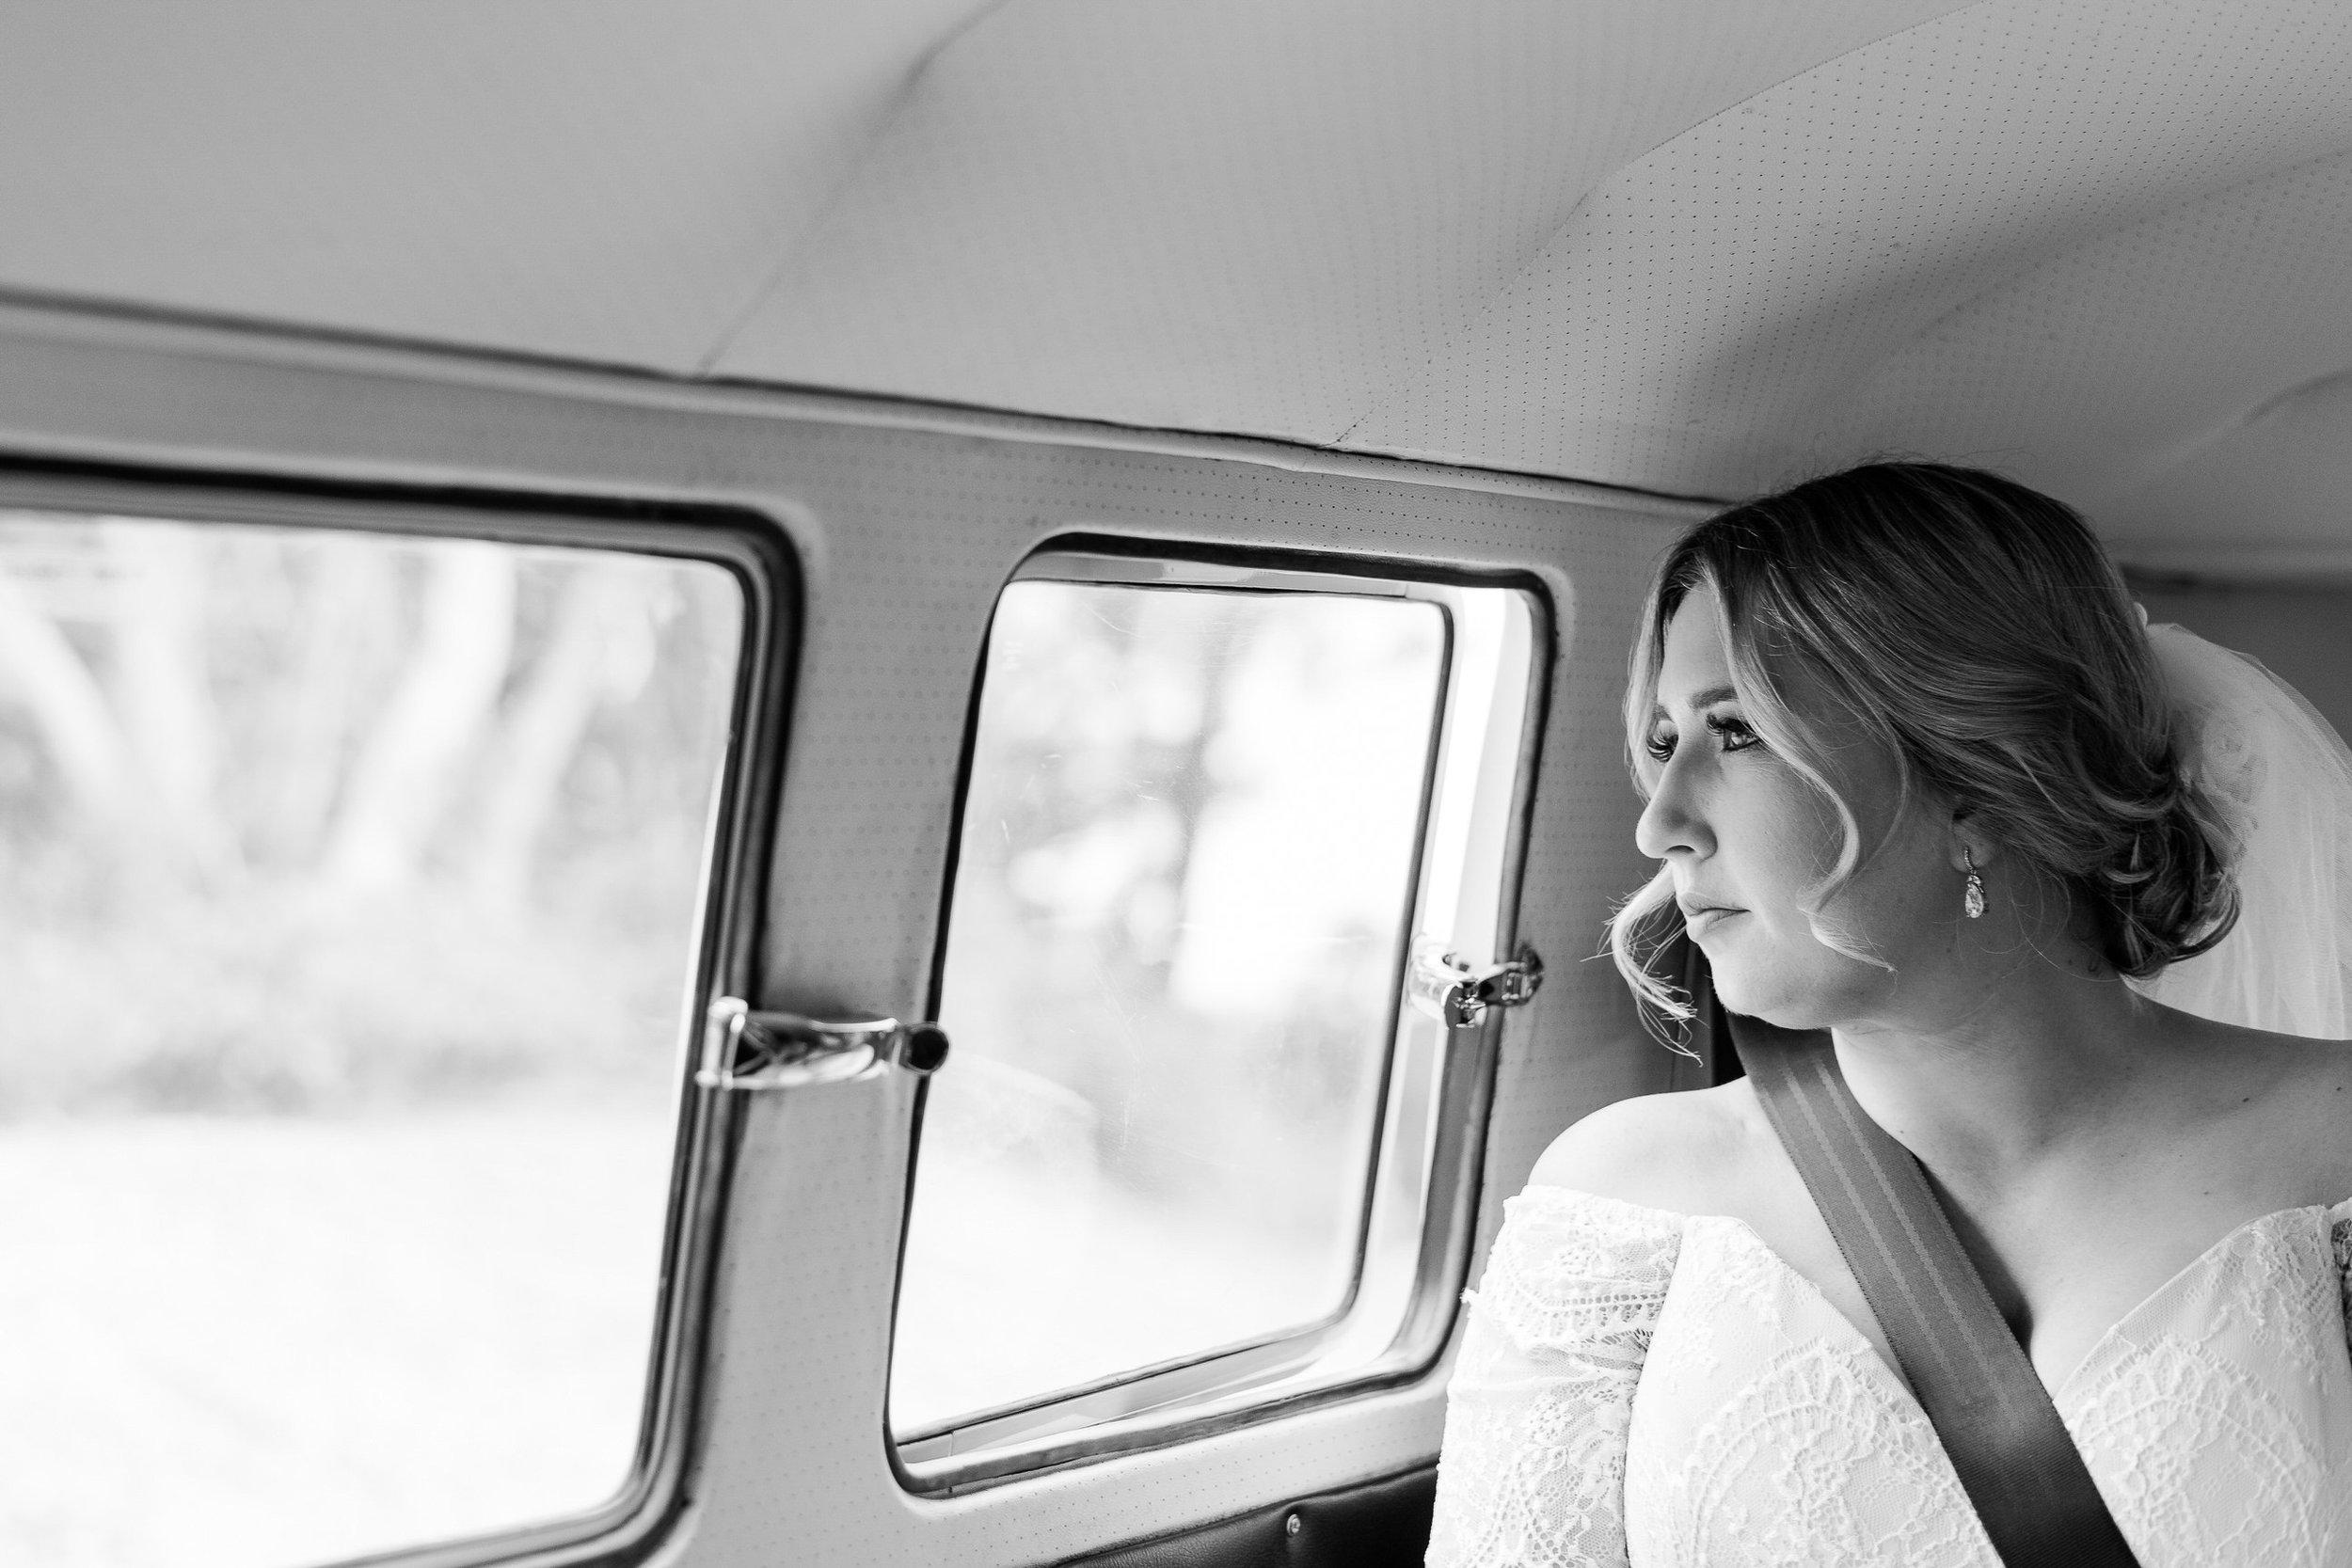 Justin_And_Jim_Photography_Portsea_Pub_Wedding33.JPG